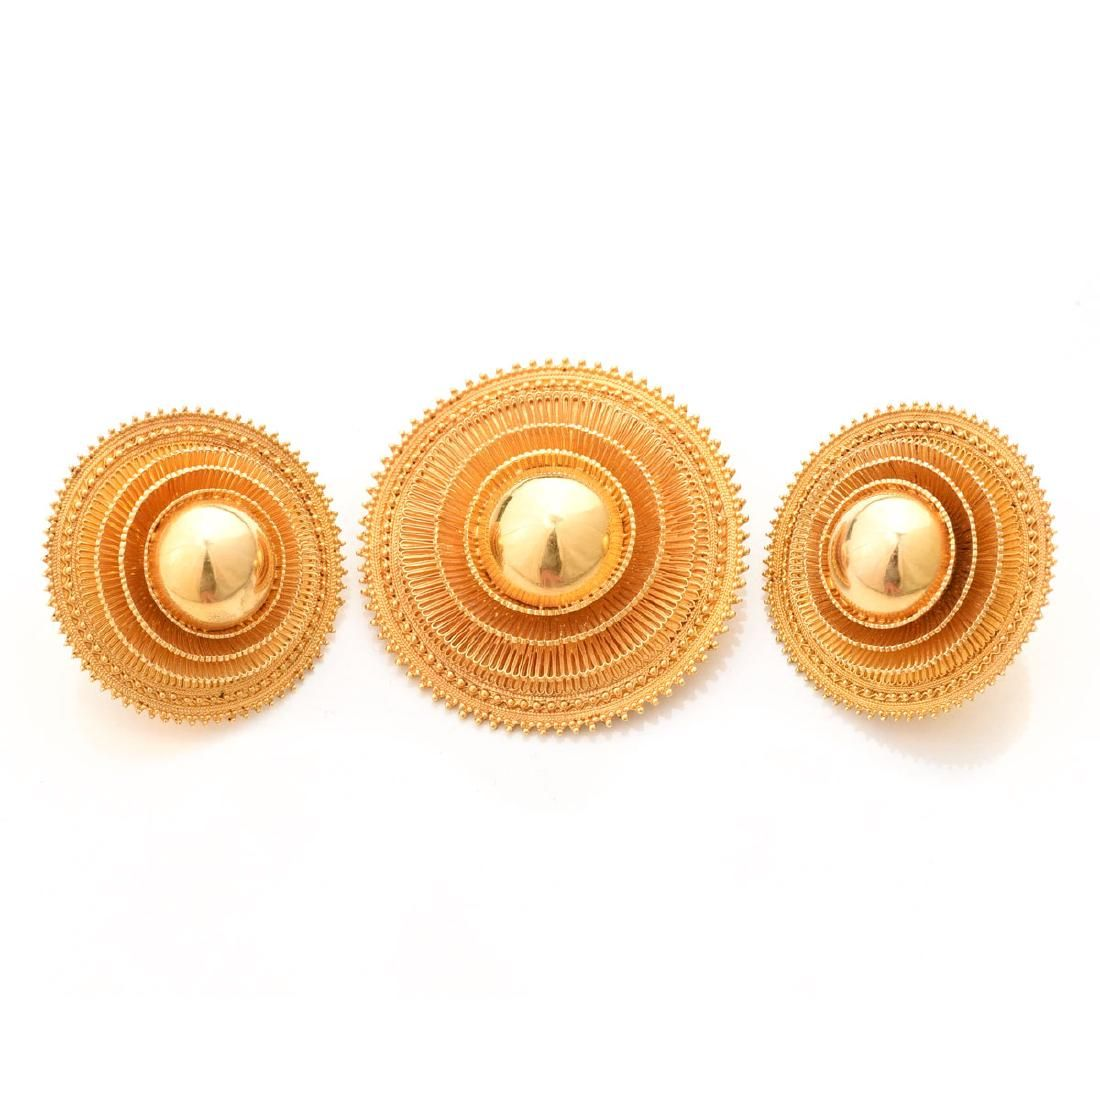 Retro Yellow Gold Sunburst Jewelry Suite.